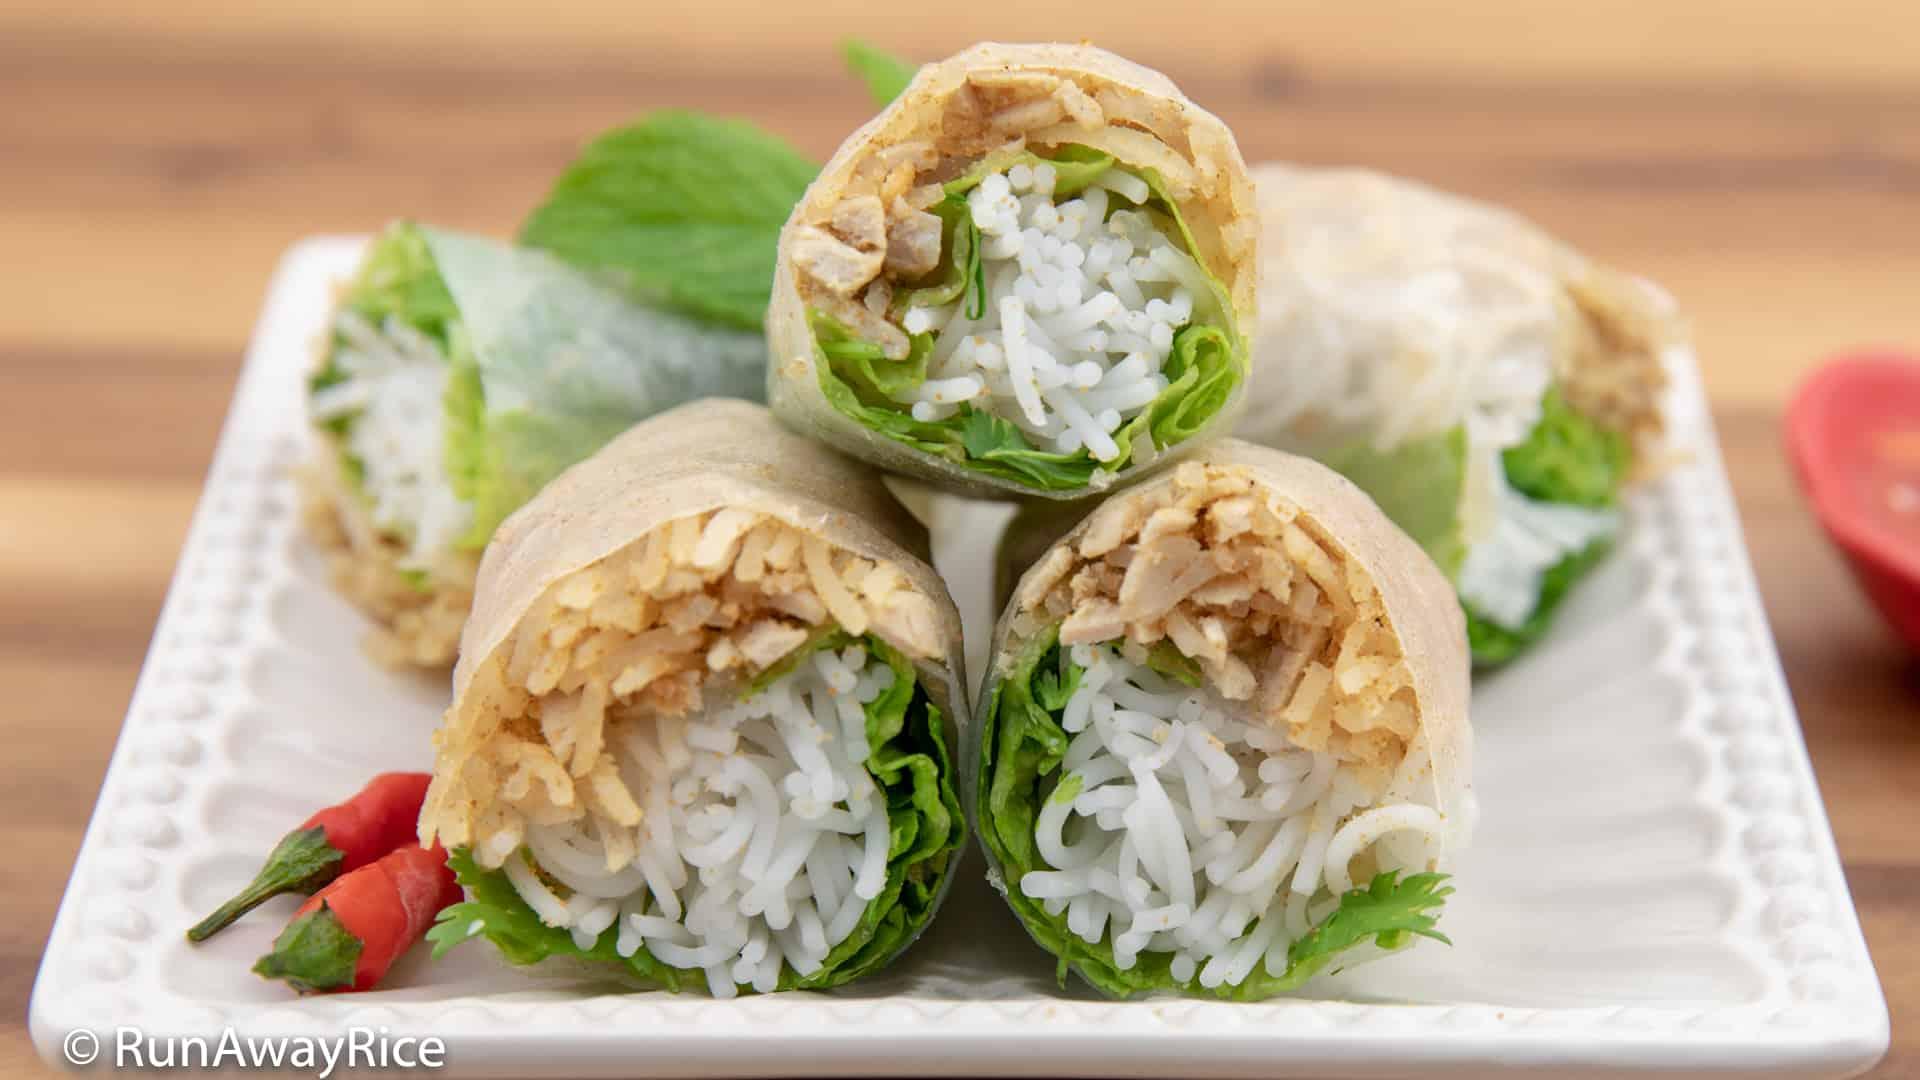 Shredded Pork Skin Fresh Spring Rolls (Bi Cuon) - Refreshing Rice Paper Rolls! | recipe from runawayrice.com